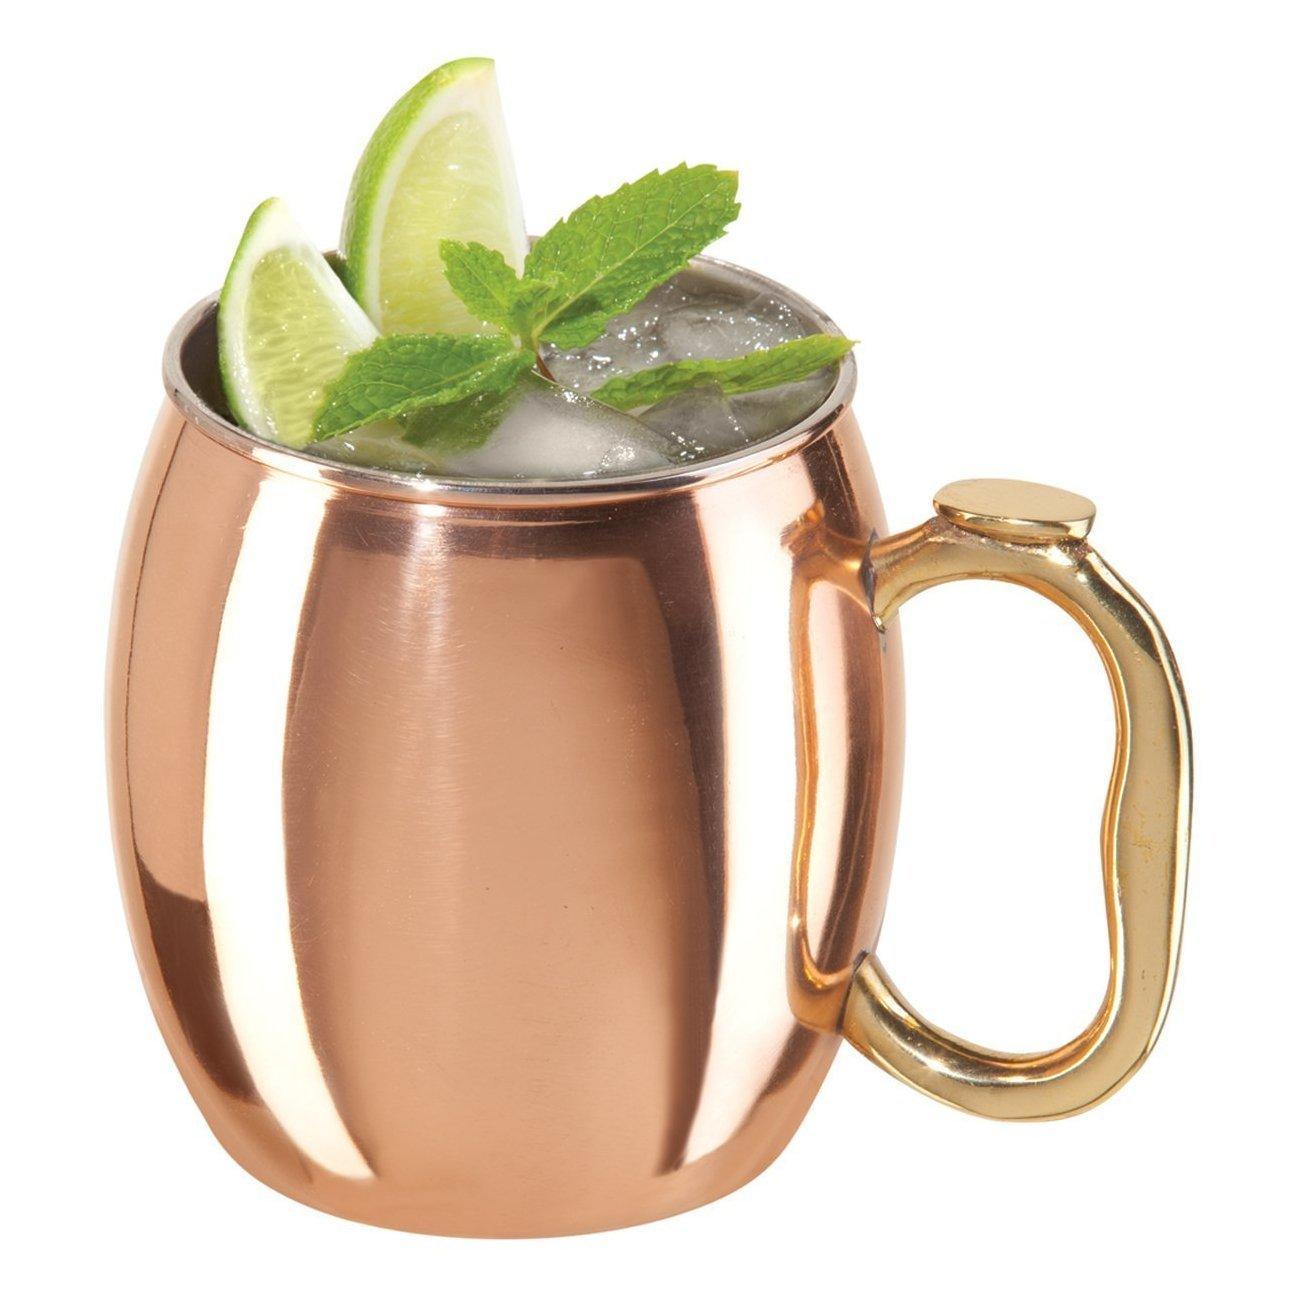 Oggi Moscow Mule Copper Mug, 20-Ounce, Set of 4 9007